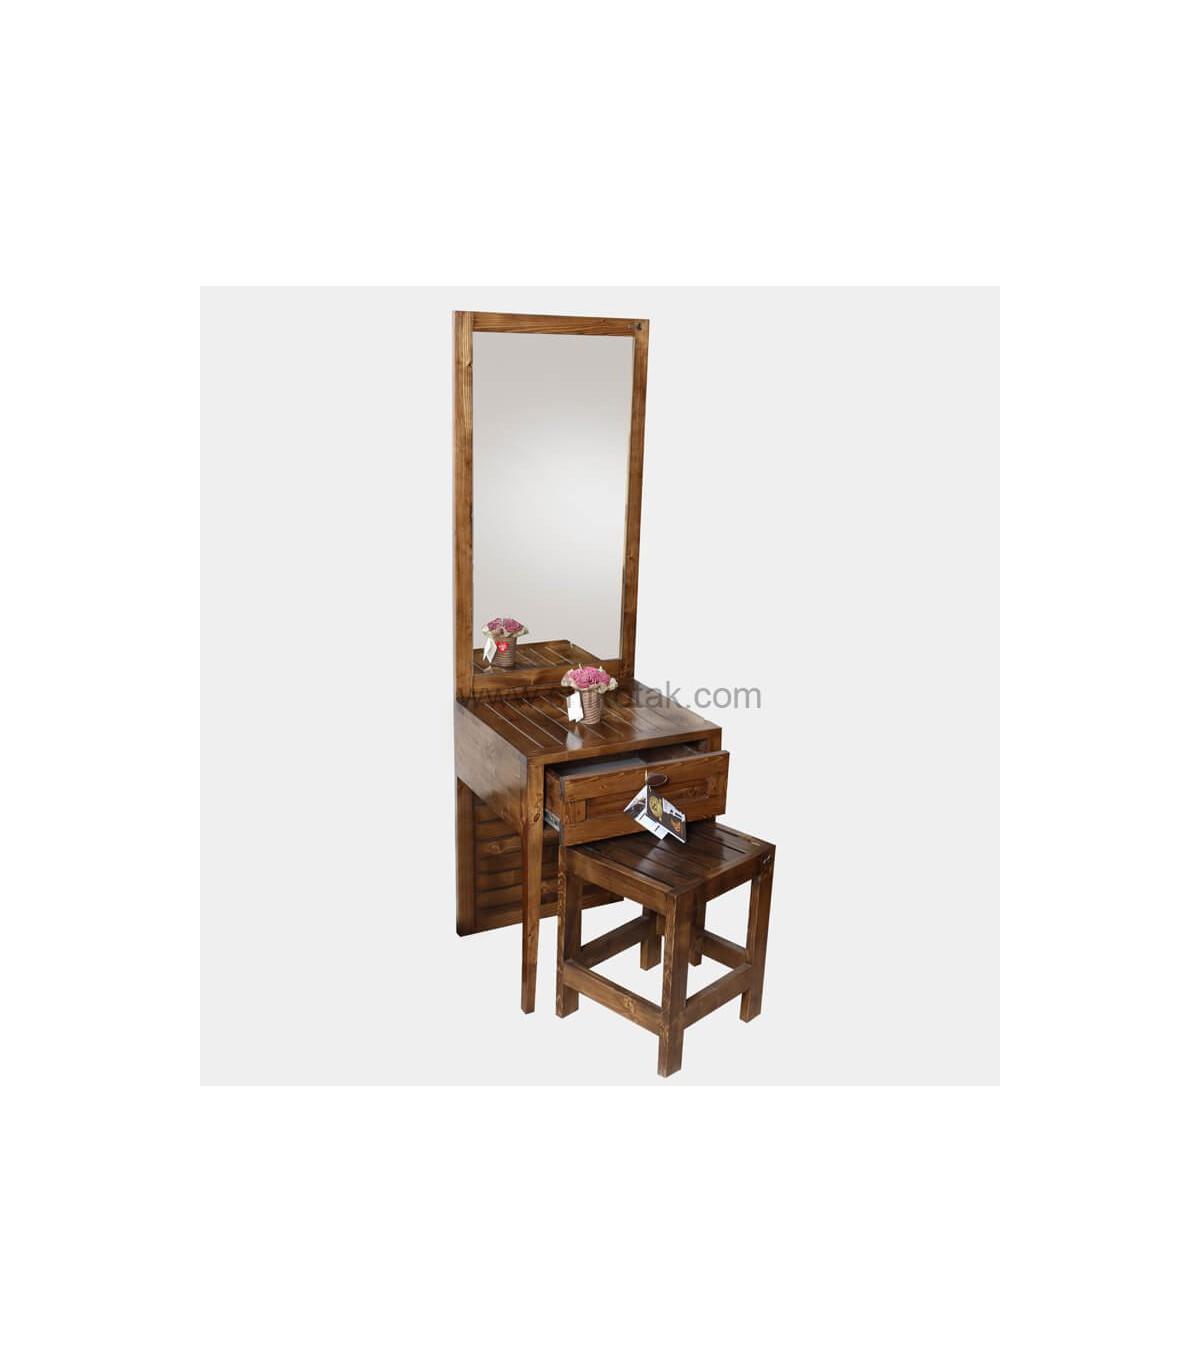 مدل میز آرایش کم جا طرح روژان تمام چوب